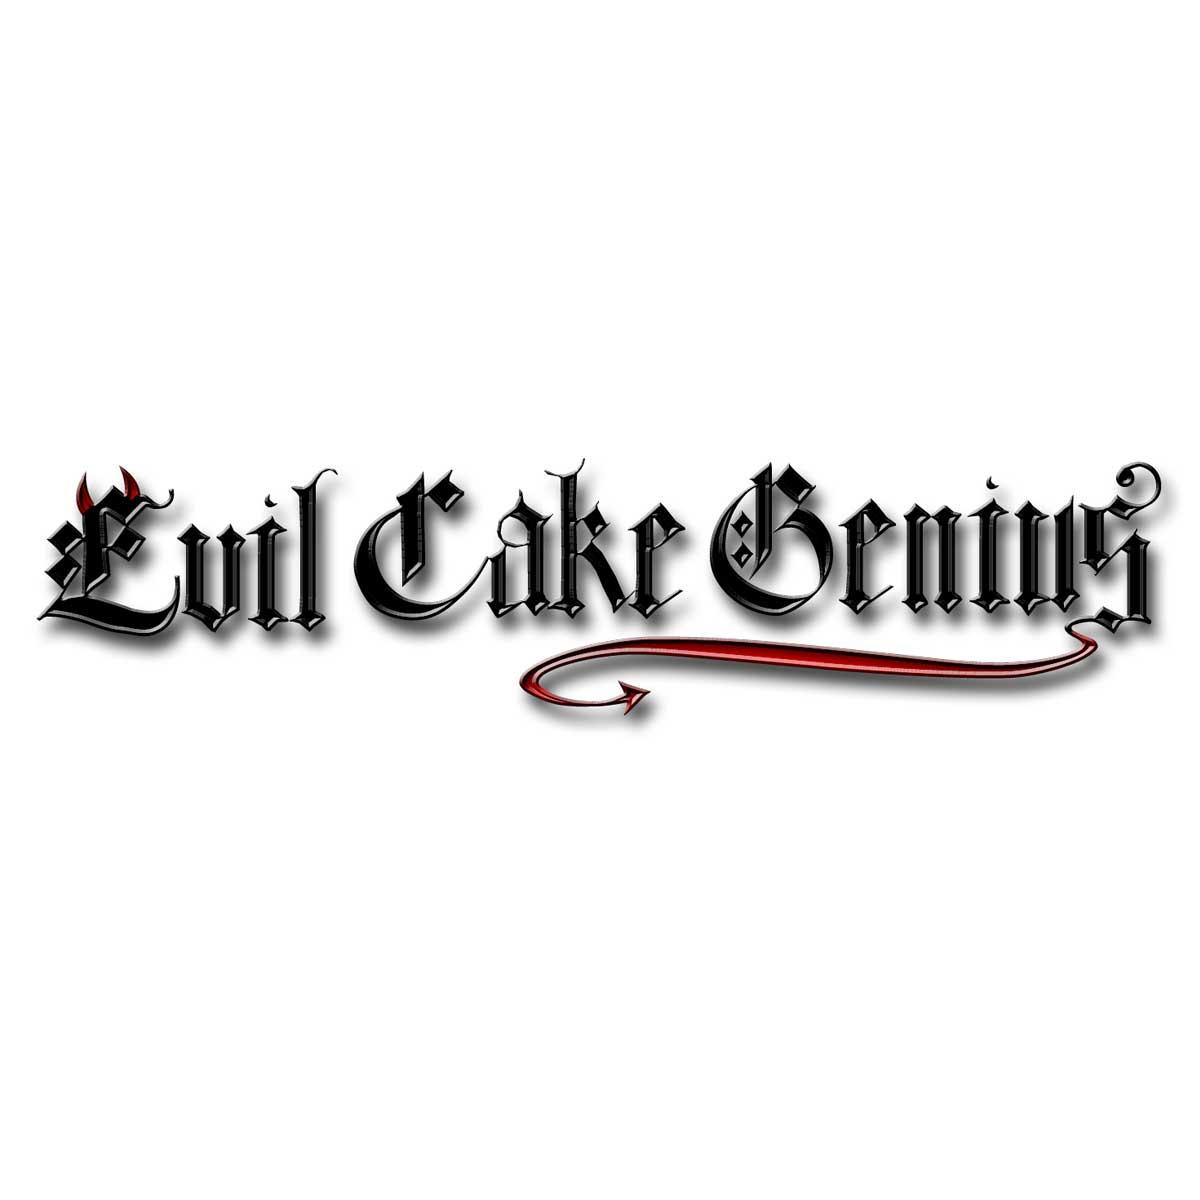 Cake Frame Pouring Kit